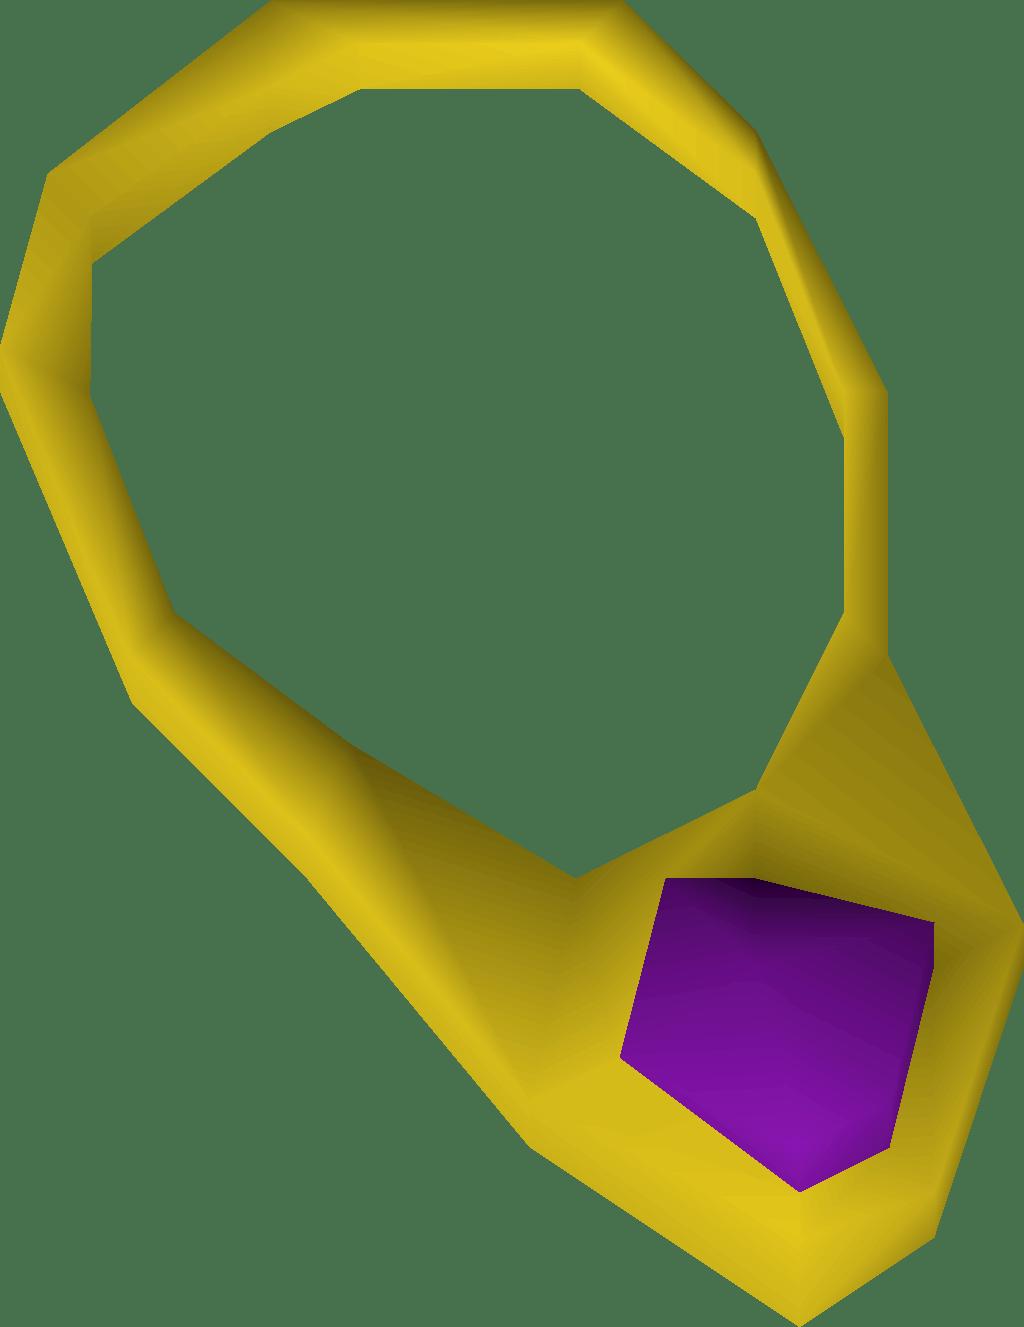 Osrs Enchant Dragonstone : enchant, dragonstone, Dragon, Necklace